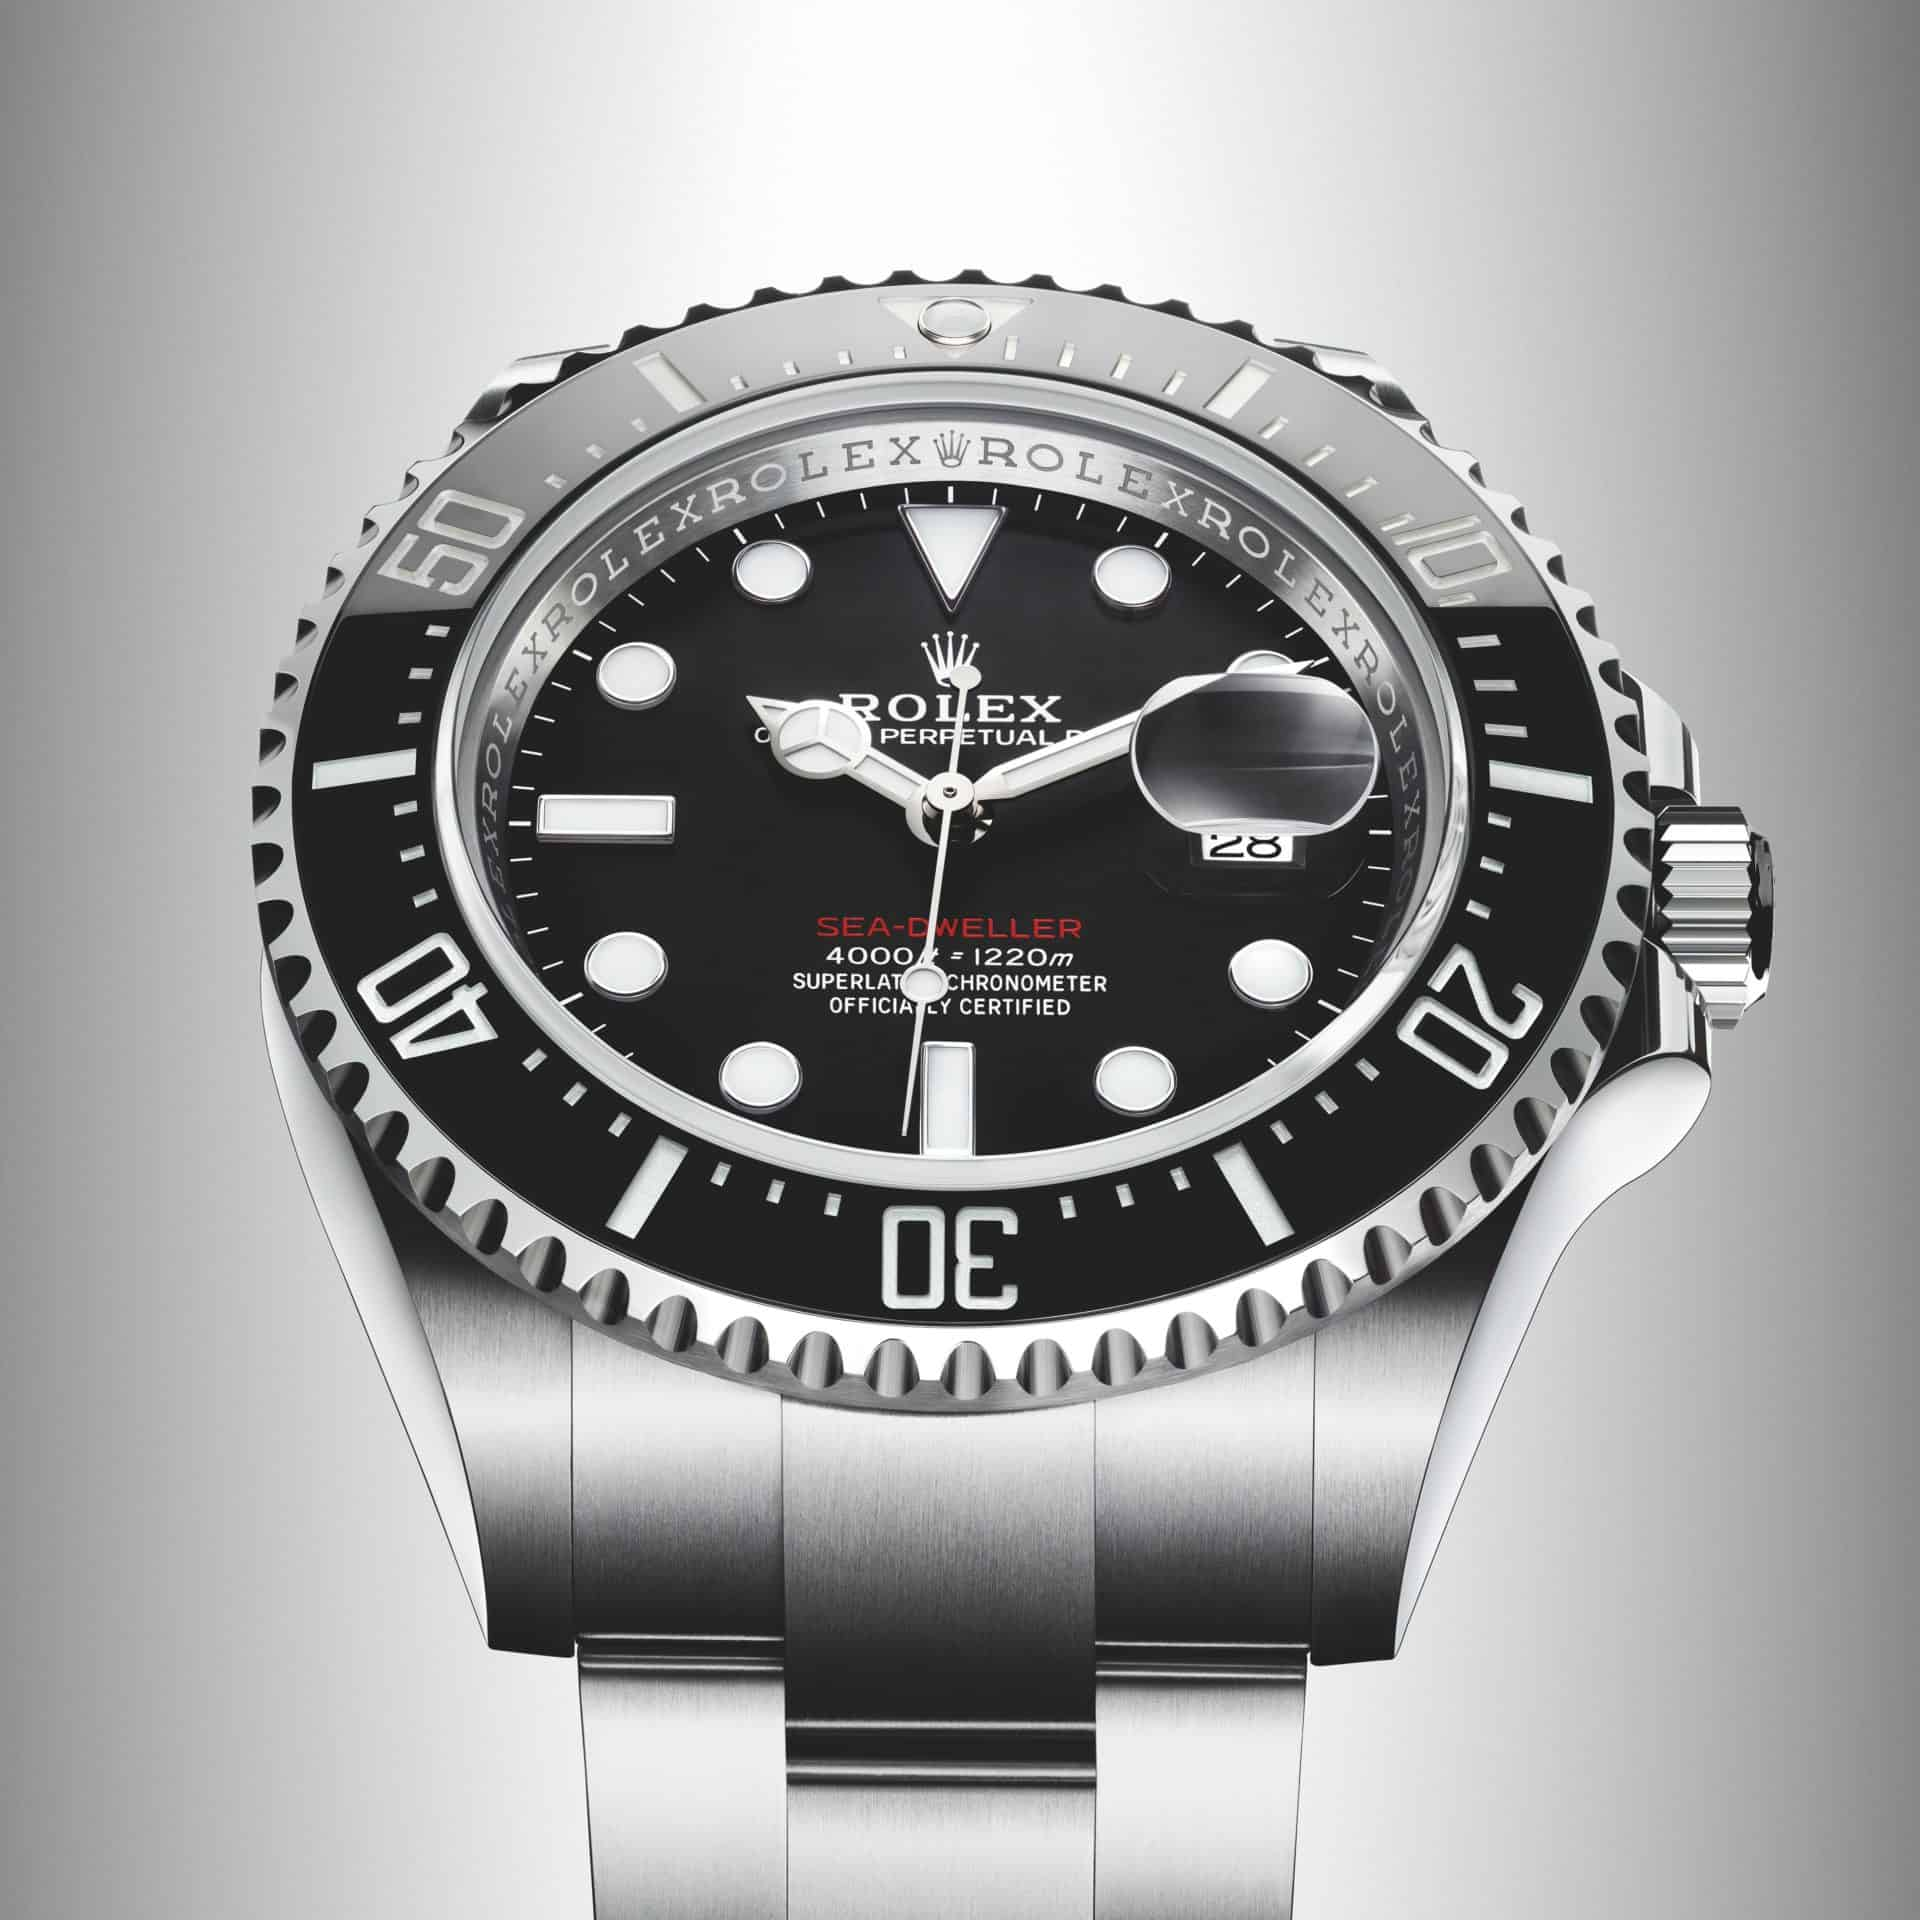 Sea Dweller 126600 006